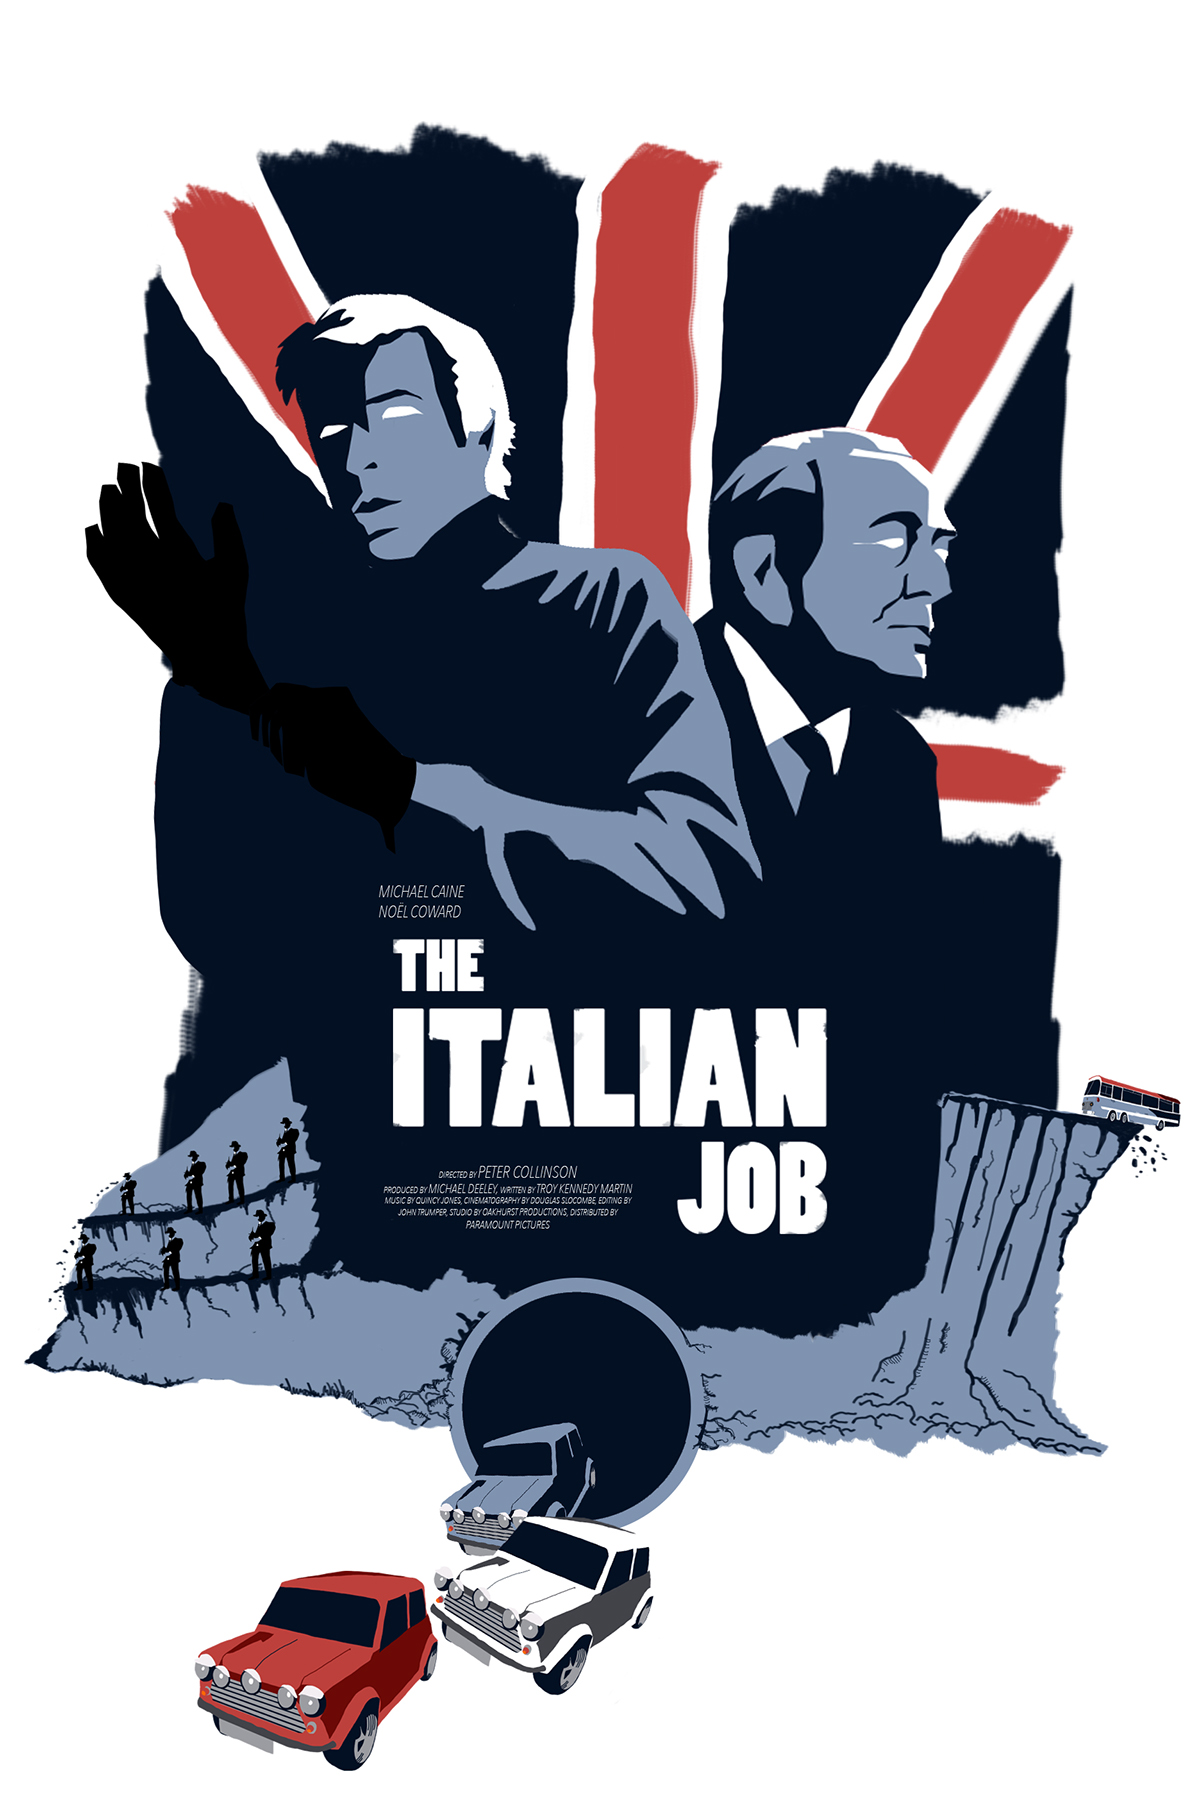 Poster design job description - Poster Design Job Description 38